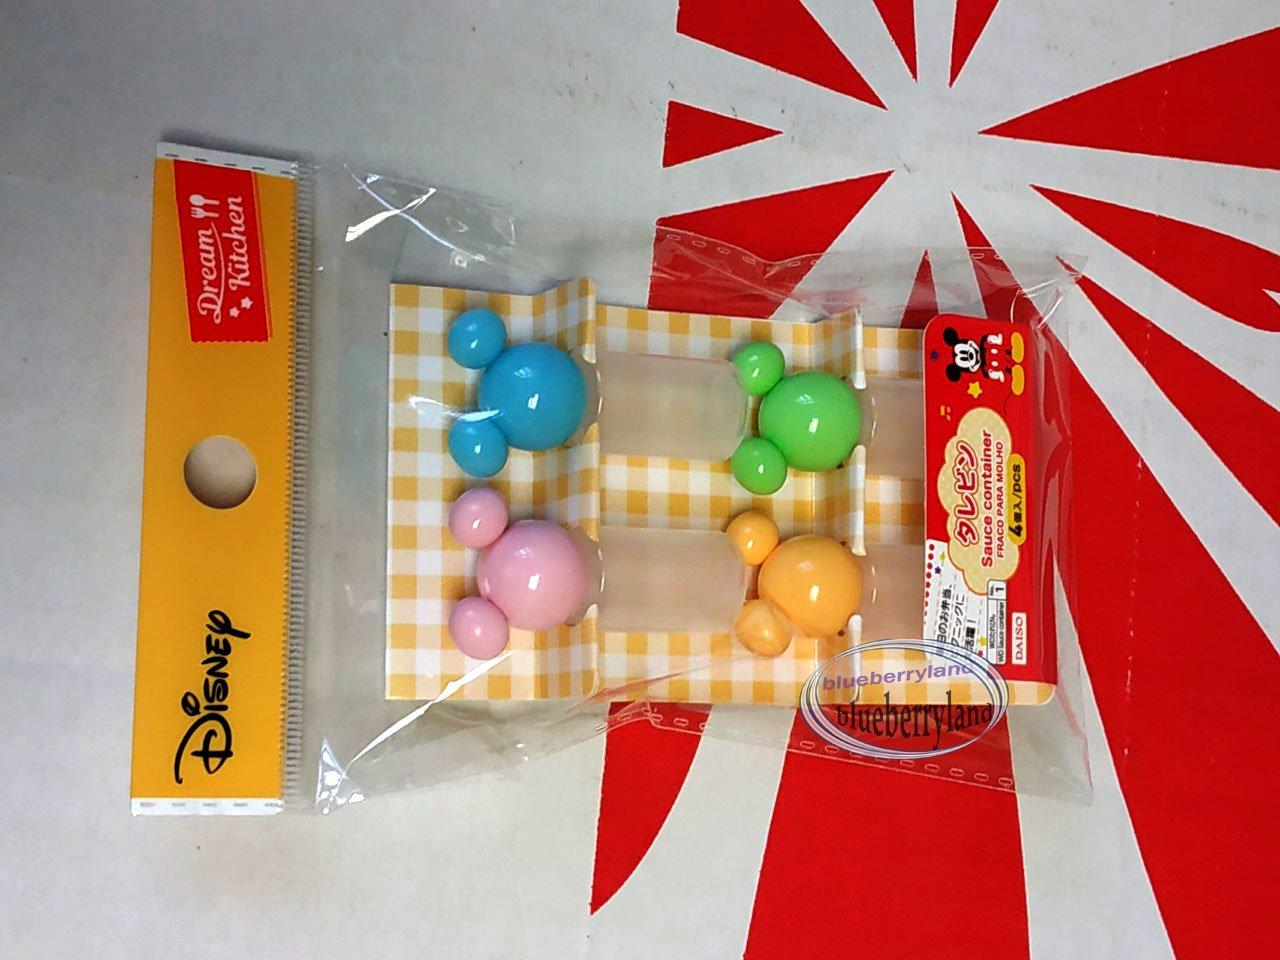 Disney Mickey Mouse Bento Sauce & Dressing Bottle 4p set x 2 Pcs lunchbox accessories